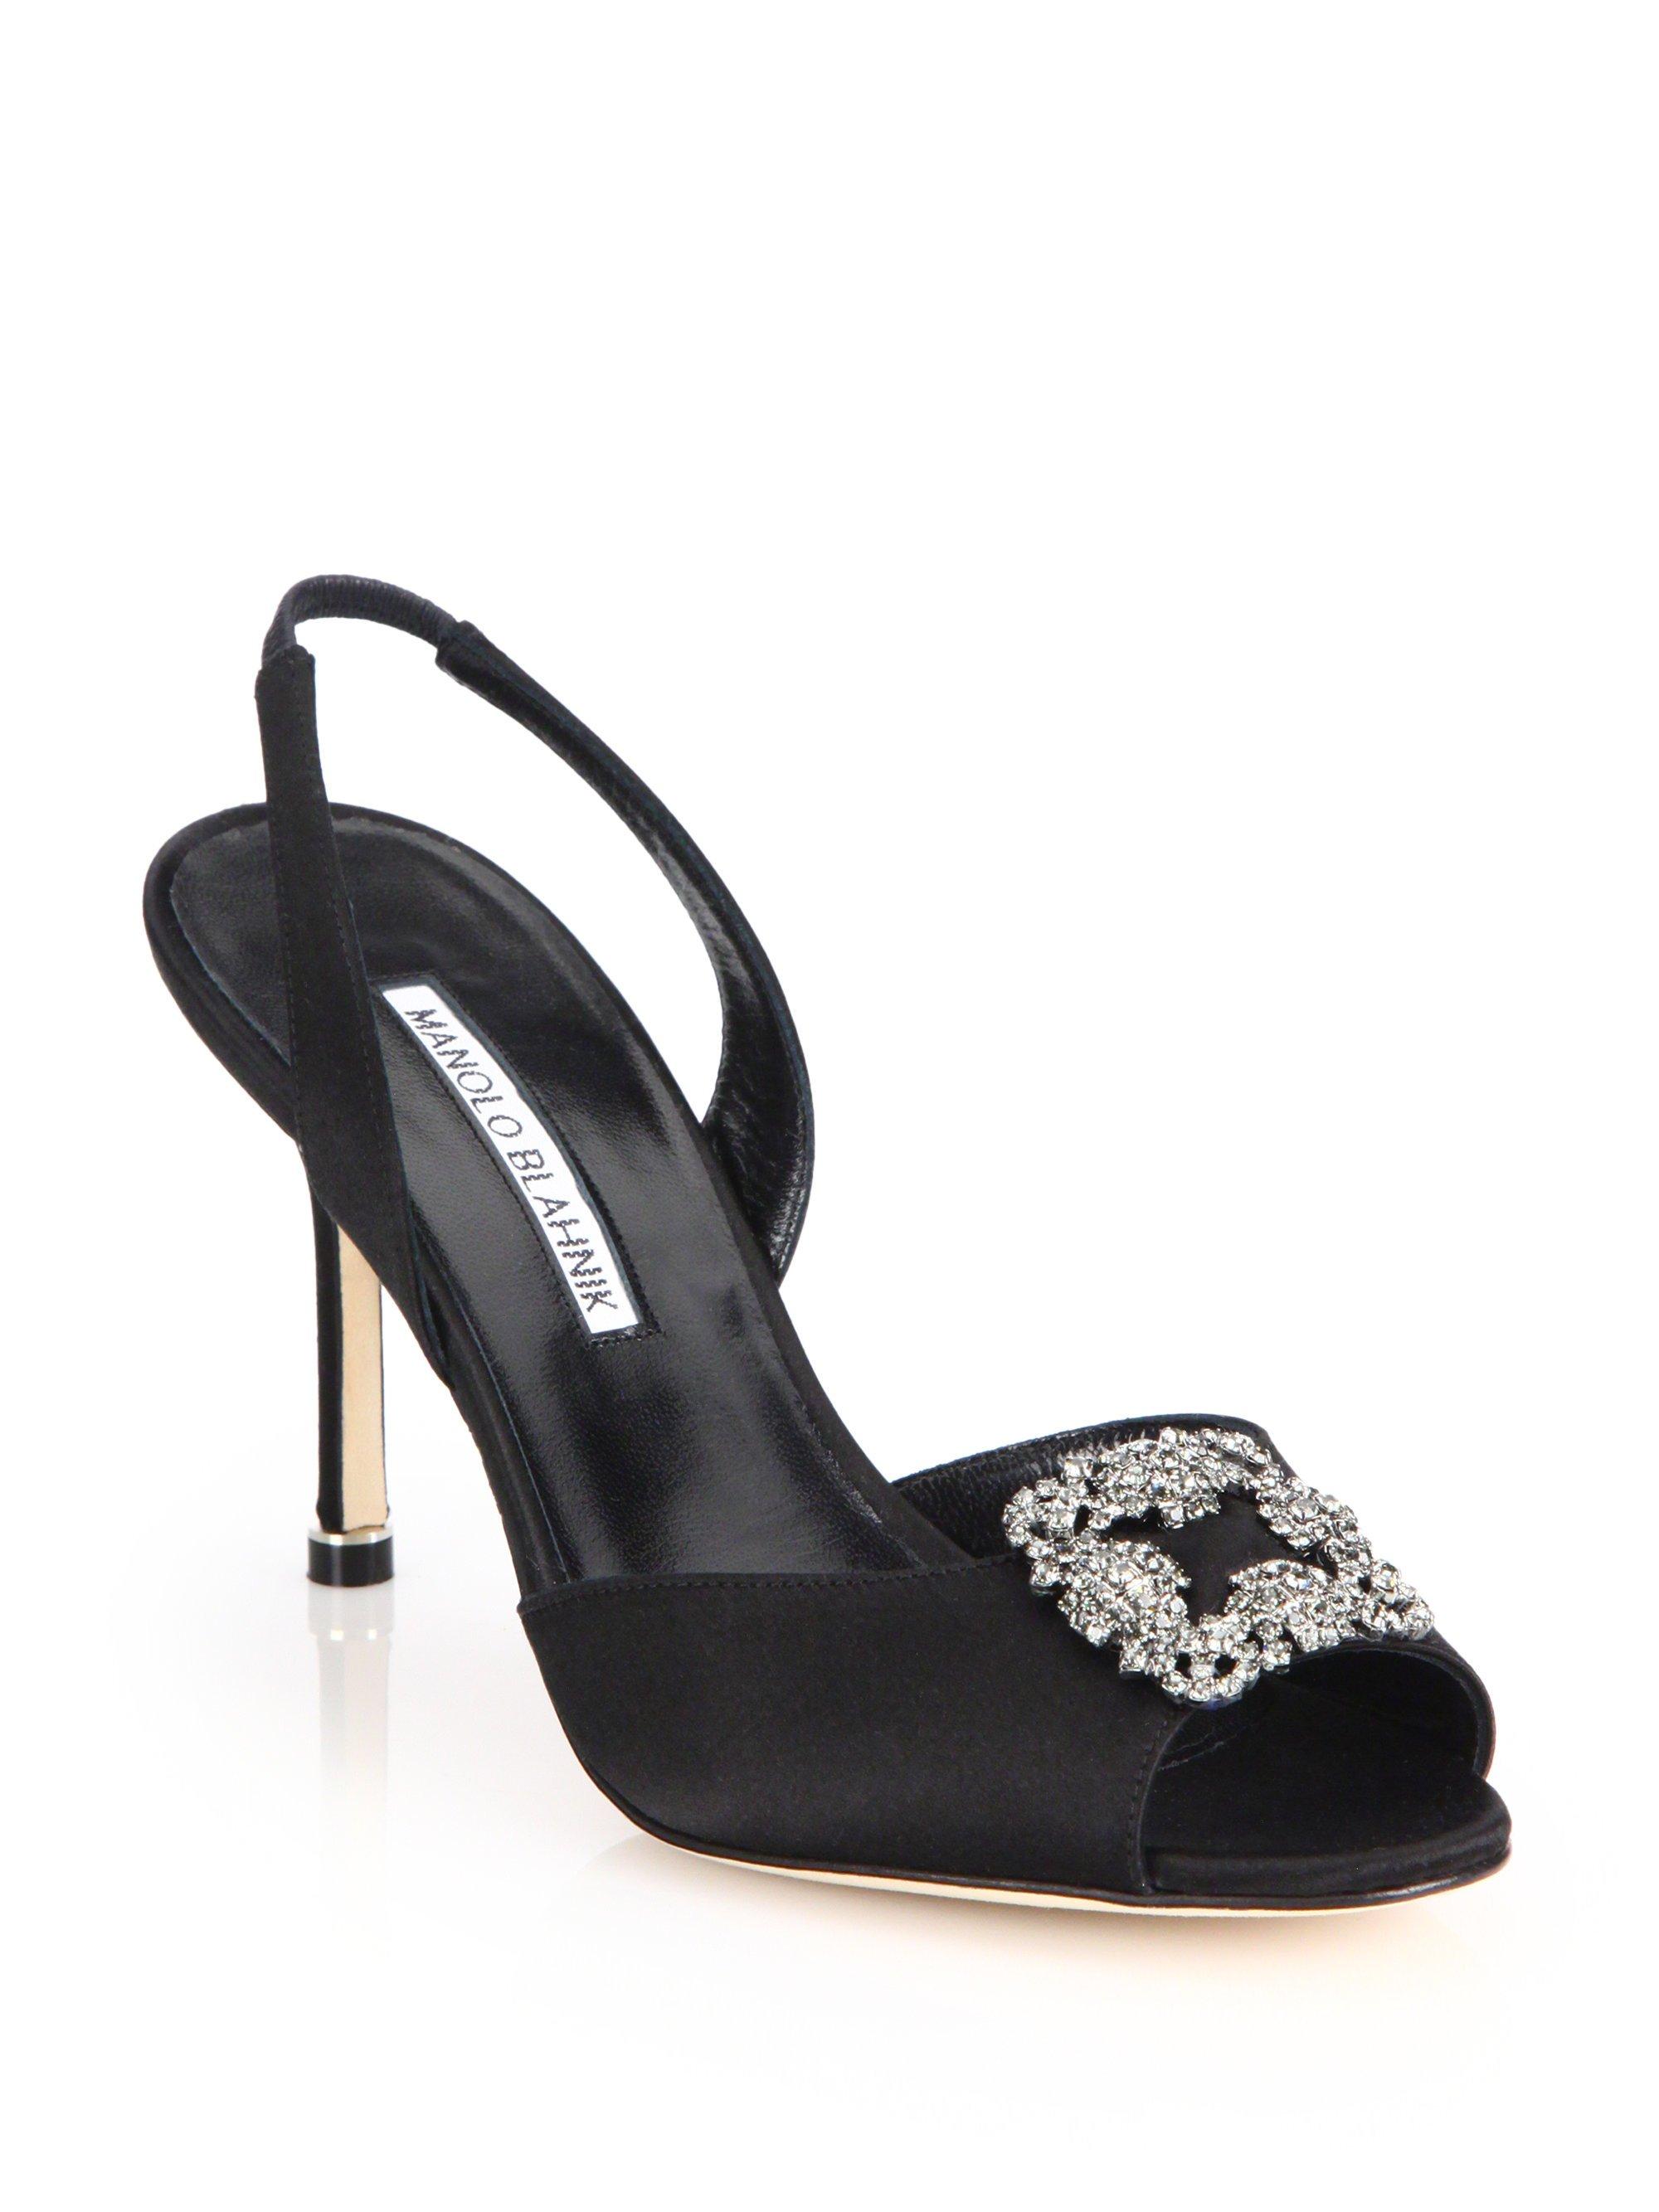 manolo blahnik slingback sandals